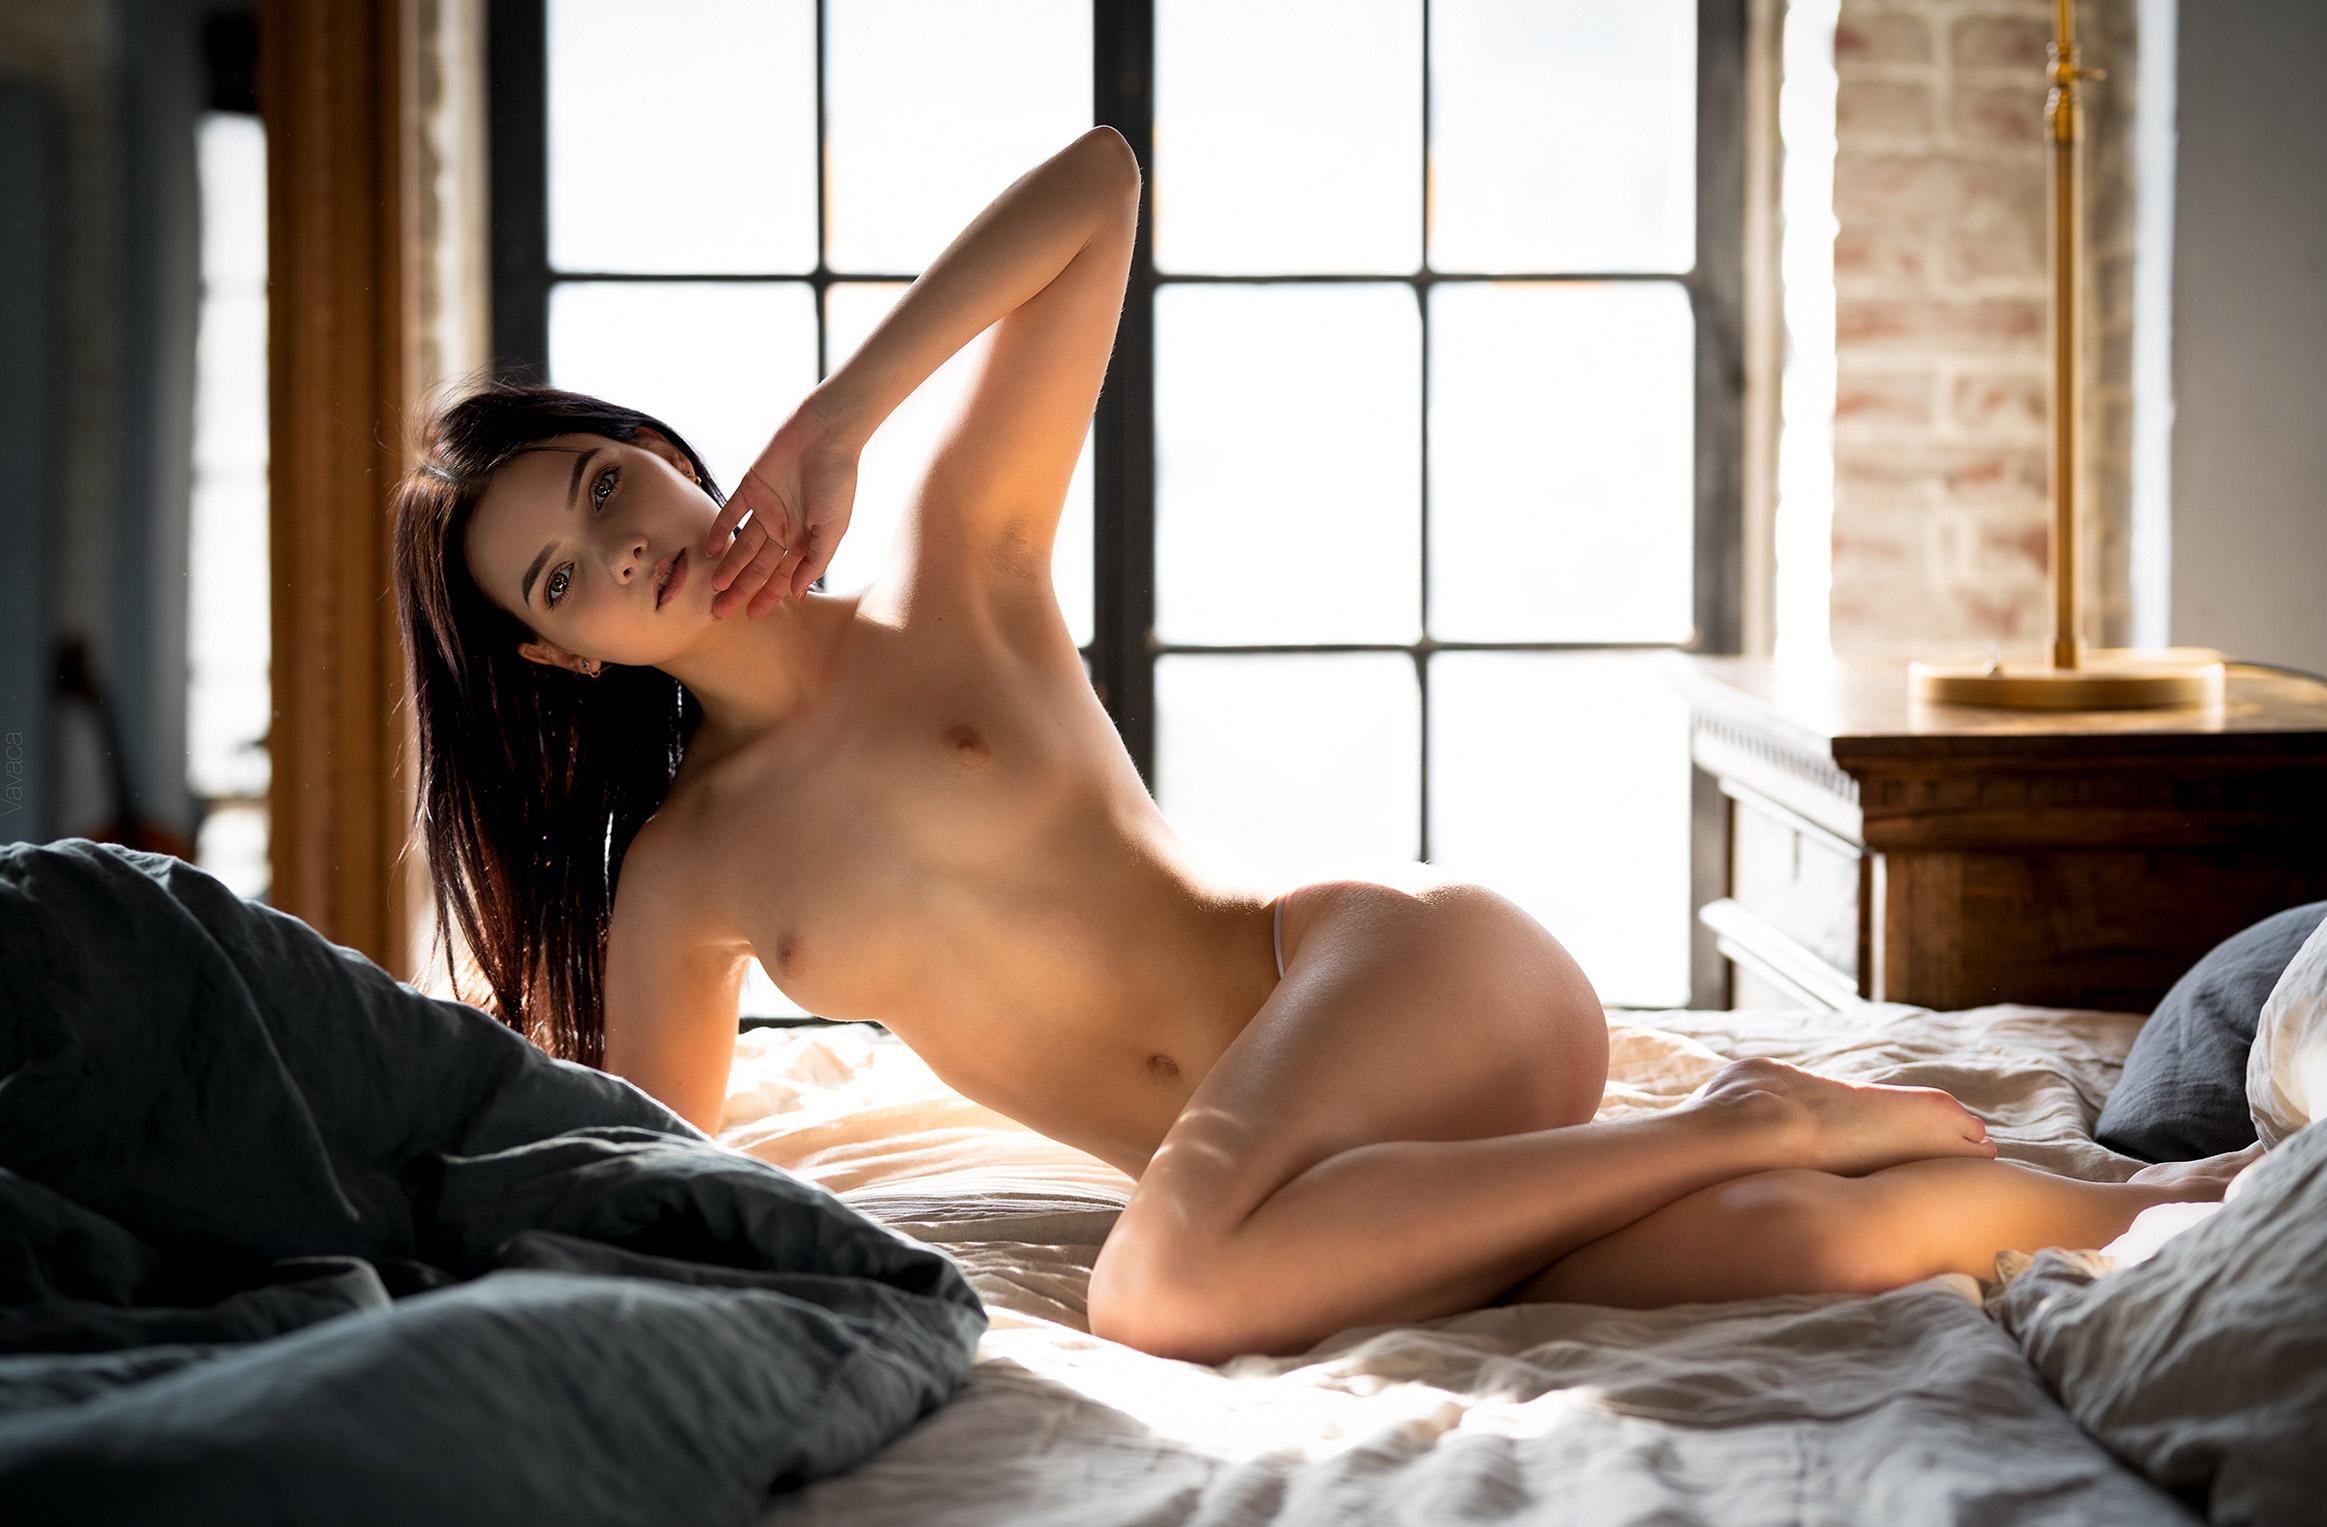 Victoria b nude